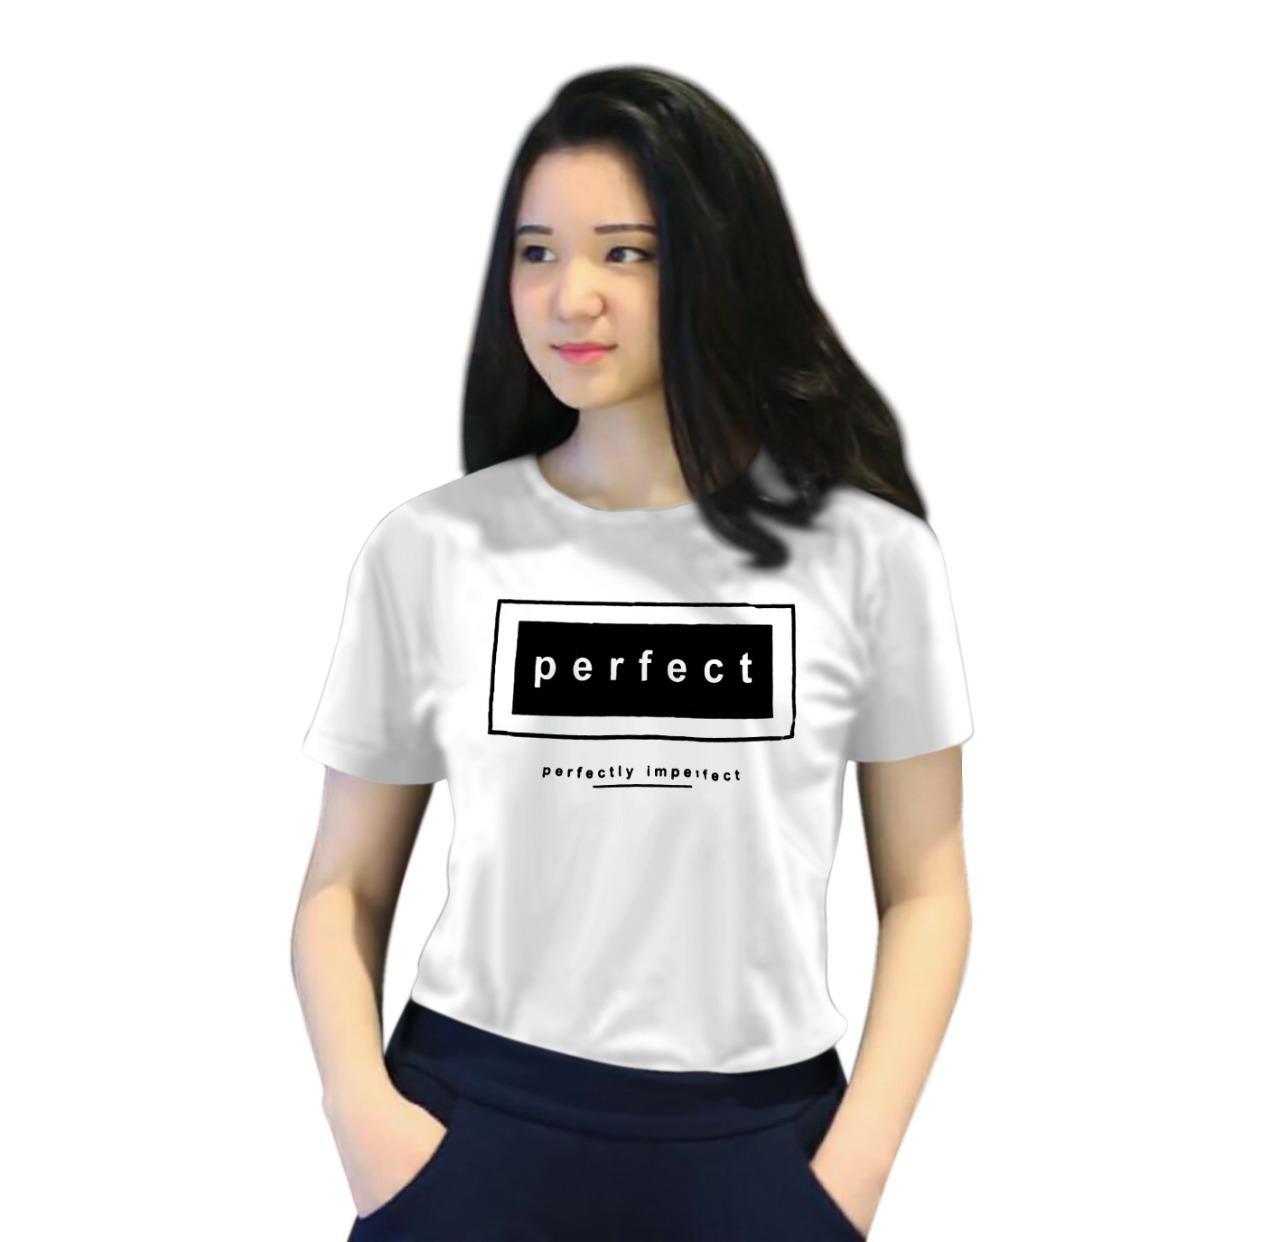 Maestro fashion kaos wanita PERFECT / T-Shirt Tumblr Tee / T-shirt Wanita